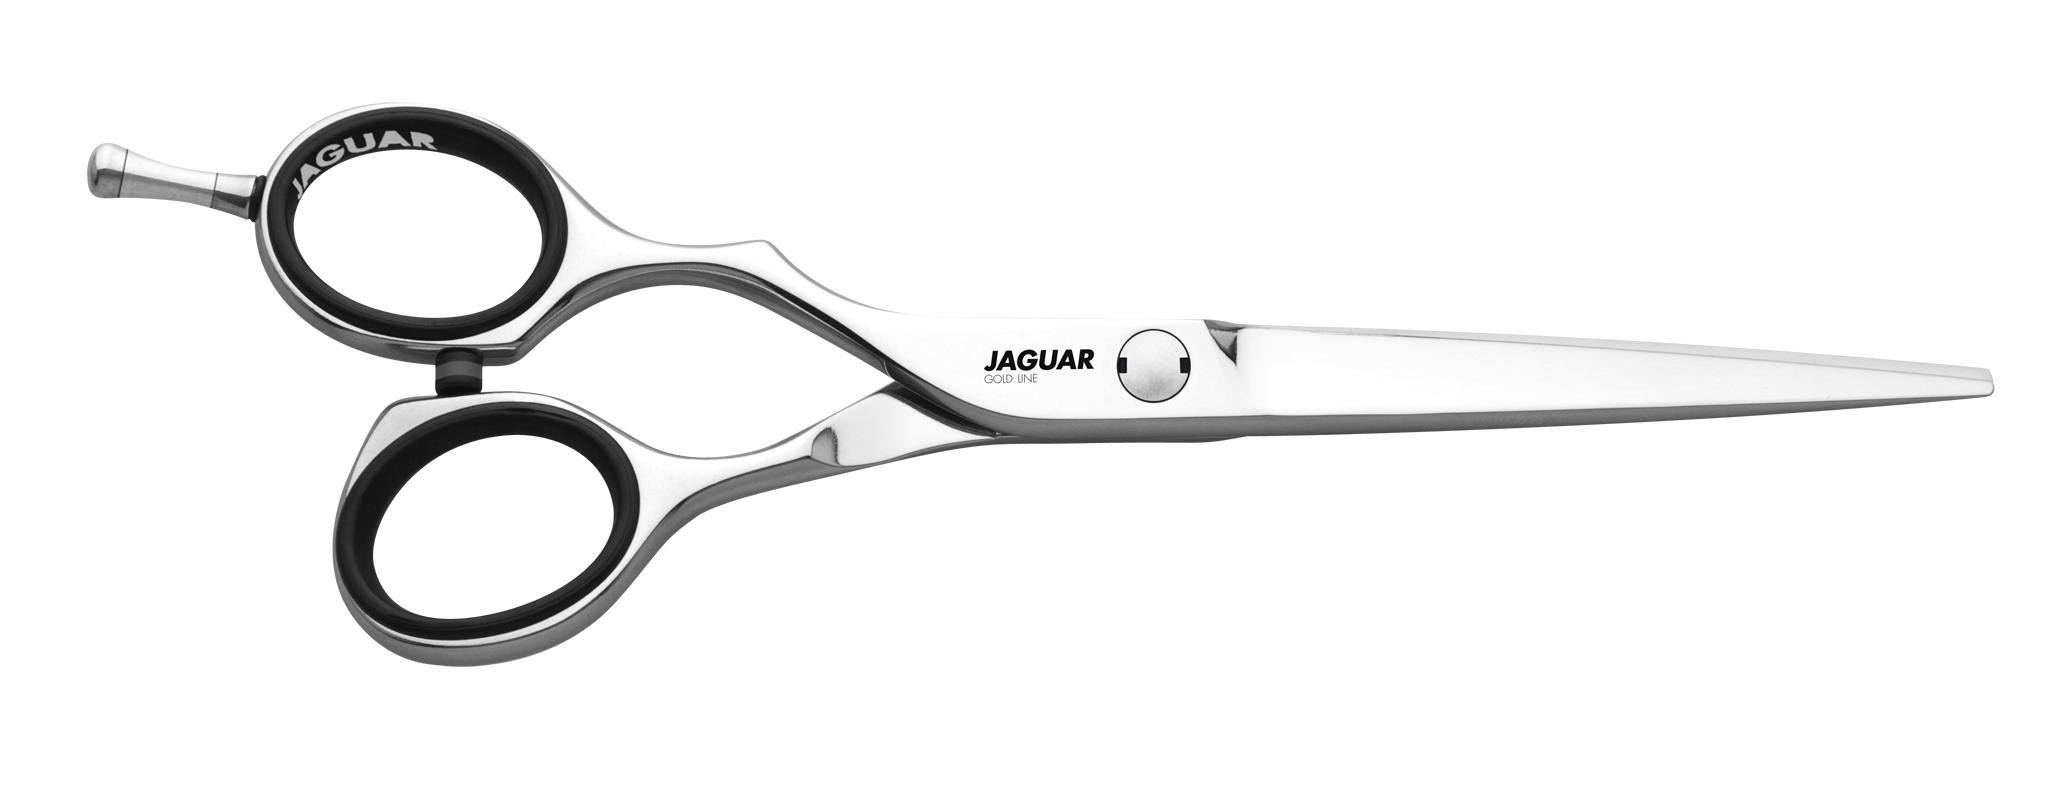 JAGUAR Ножницы Jaguar Diamond Left 5,25'(13,5cm)GL для левши jaguar ножницы cj 4 plus left ножницы cj 4 plus left 1 шт 99525 5 25&apos